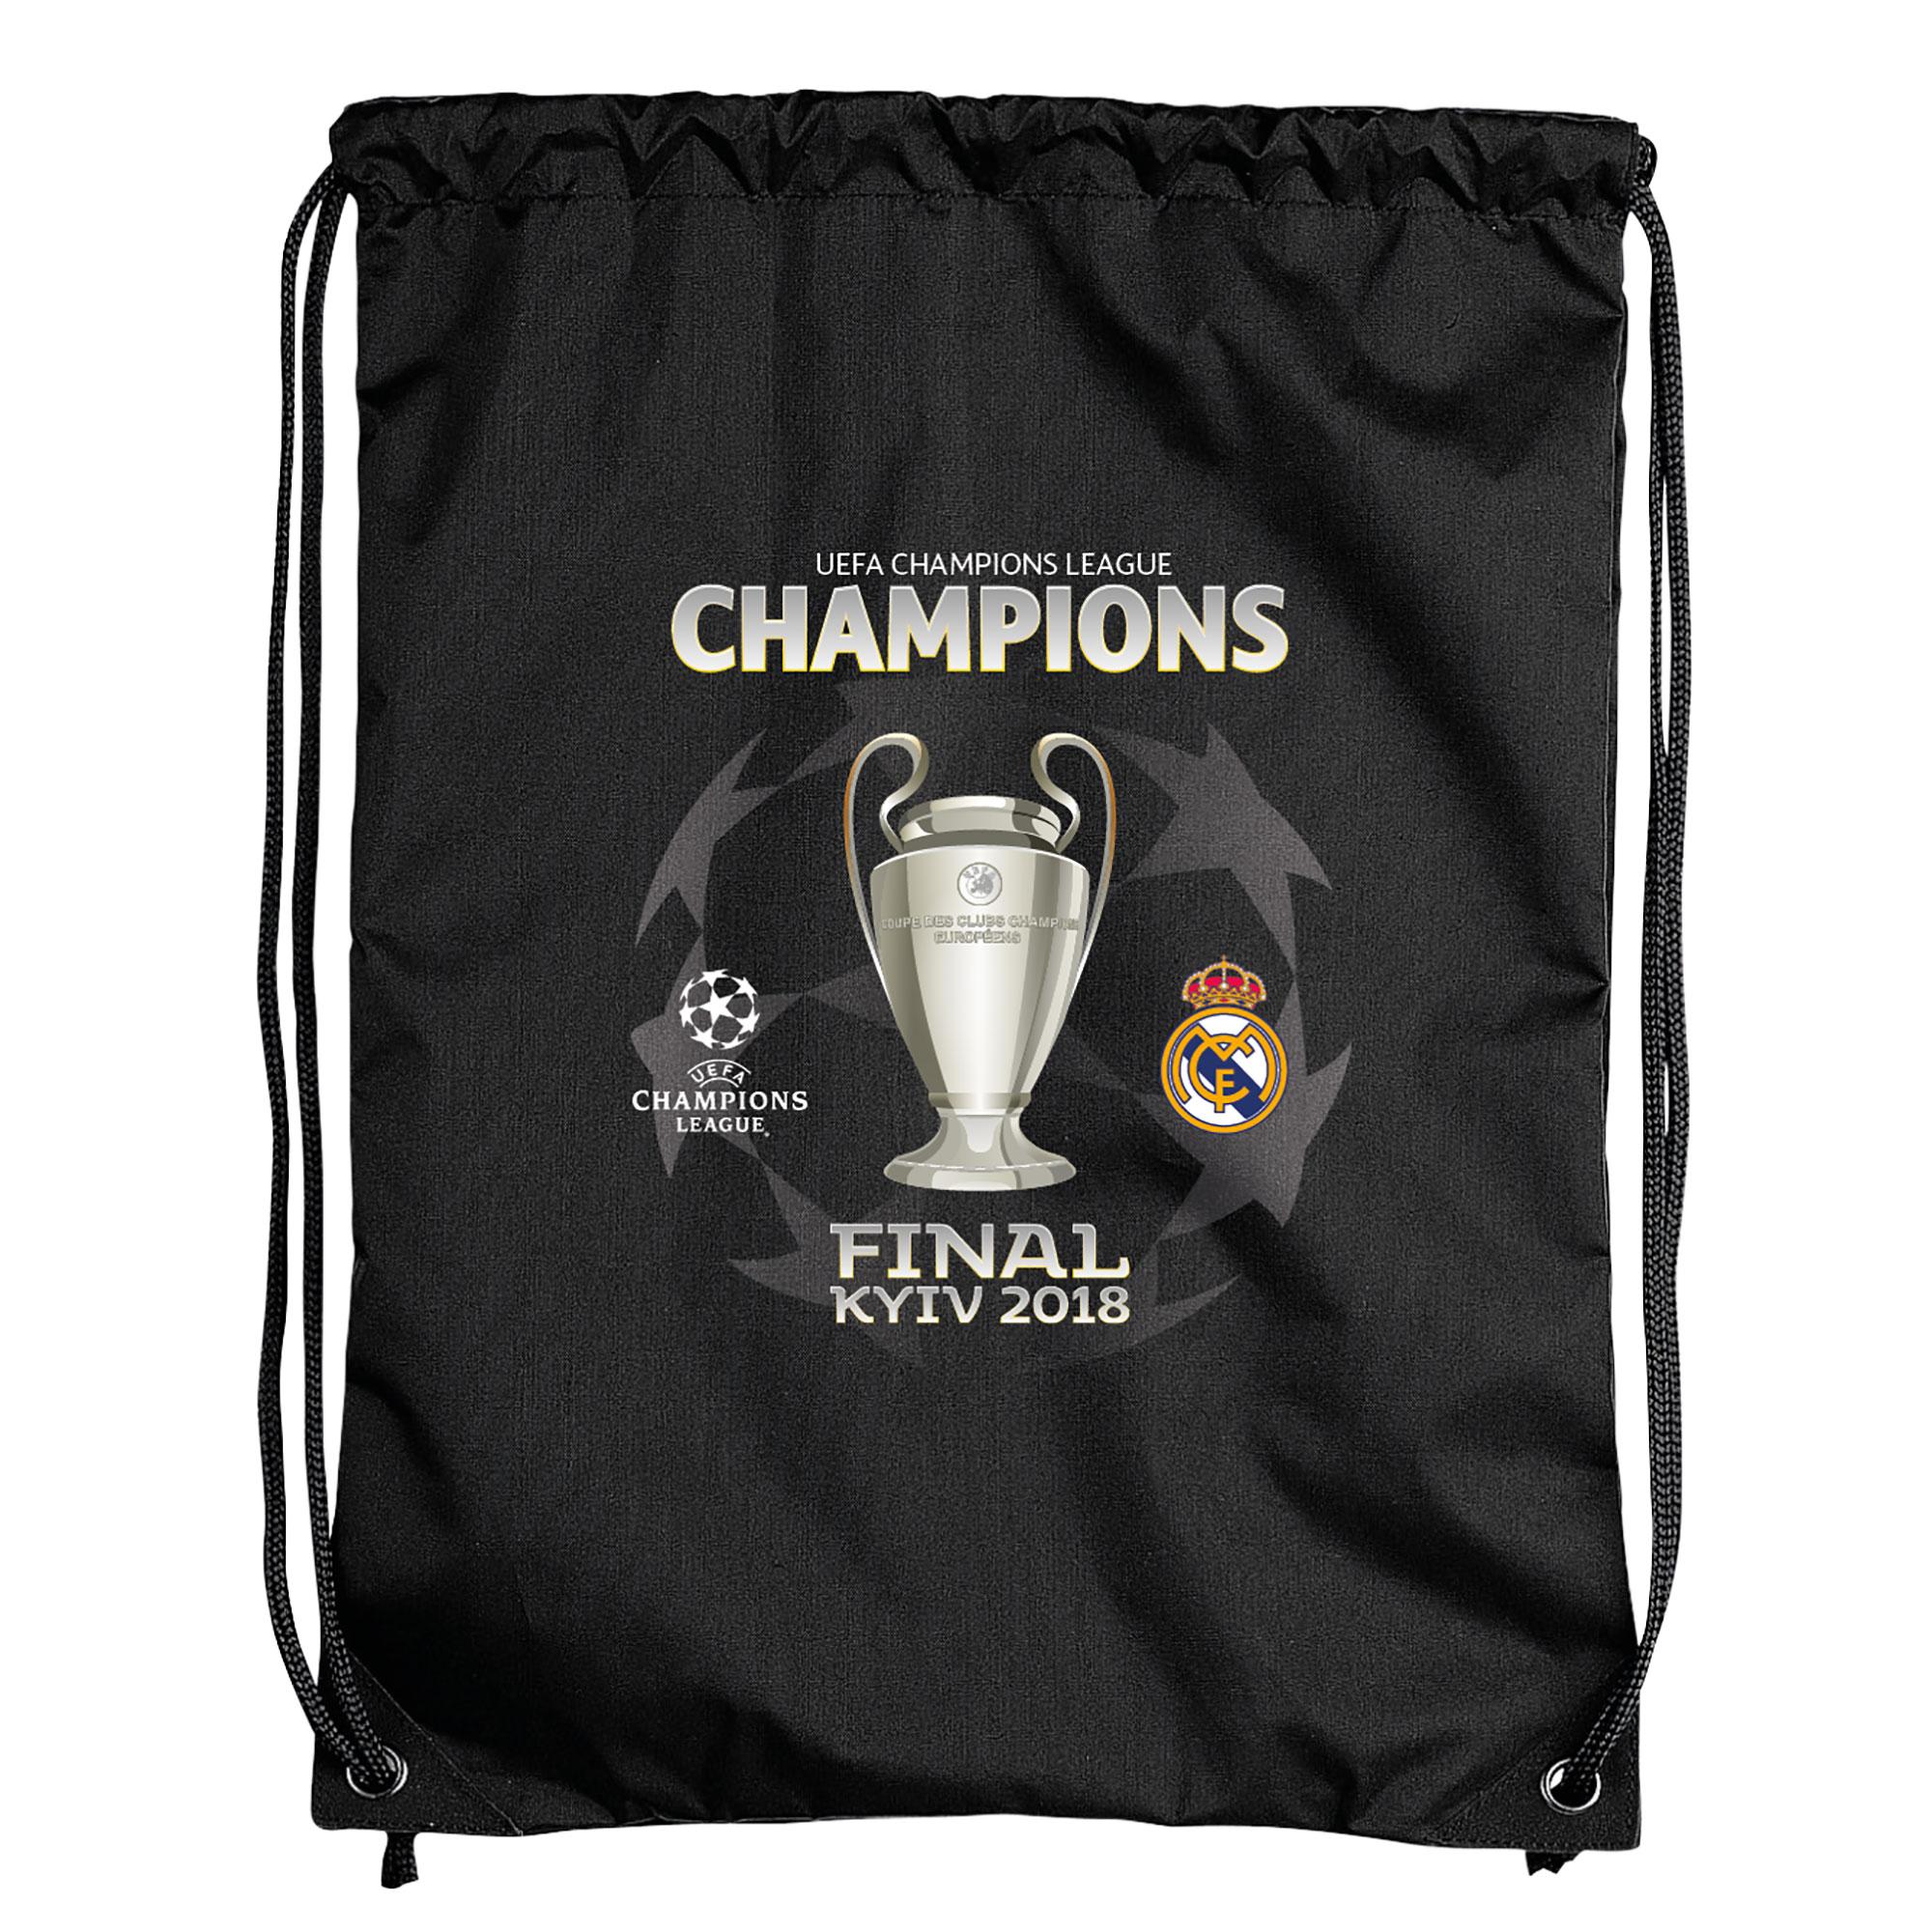 Sac de sport Winners Real Madrid UEFA Champions League 2018